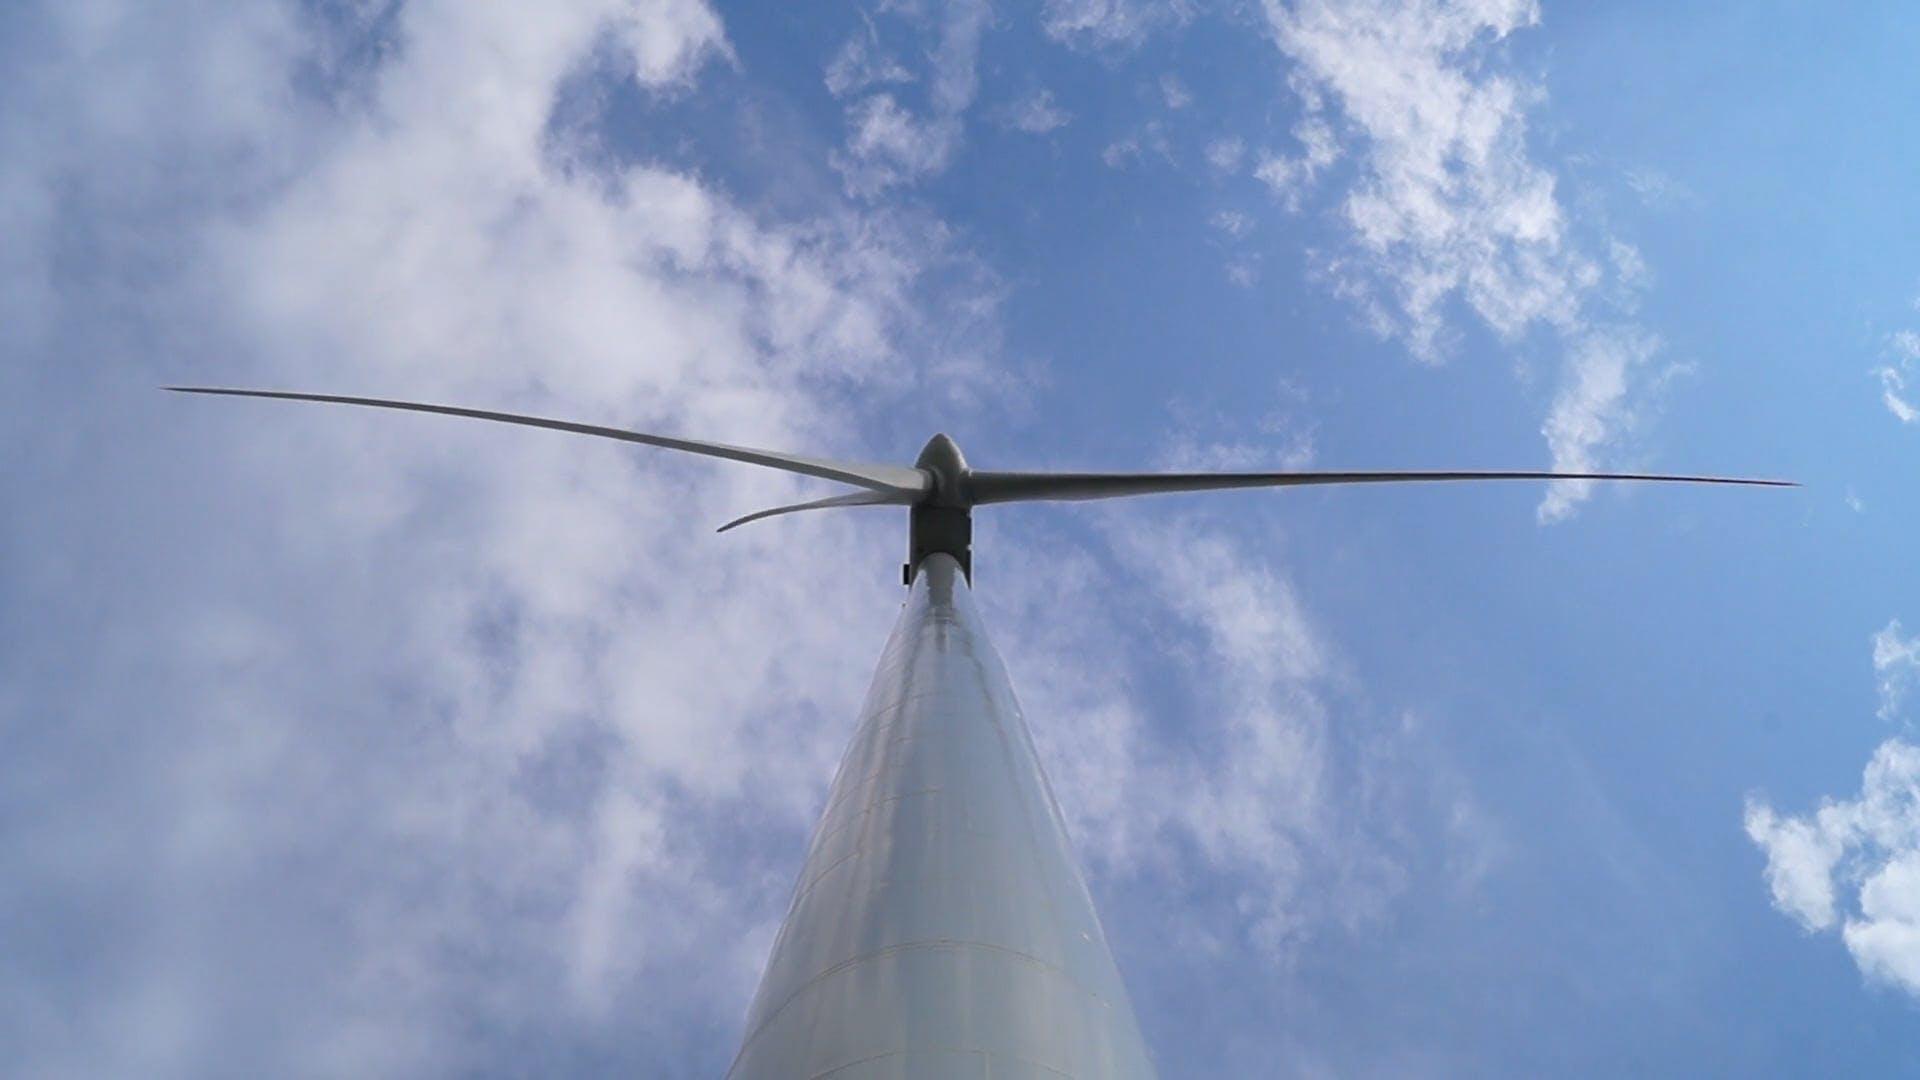 Low Angle Shot Of Wind Turbine